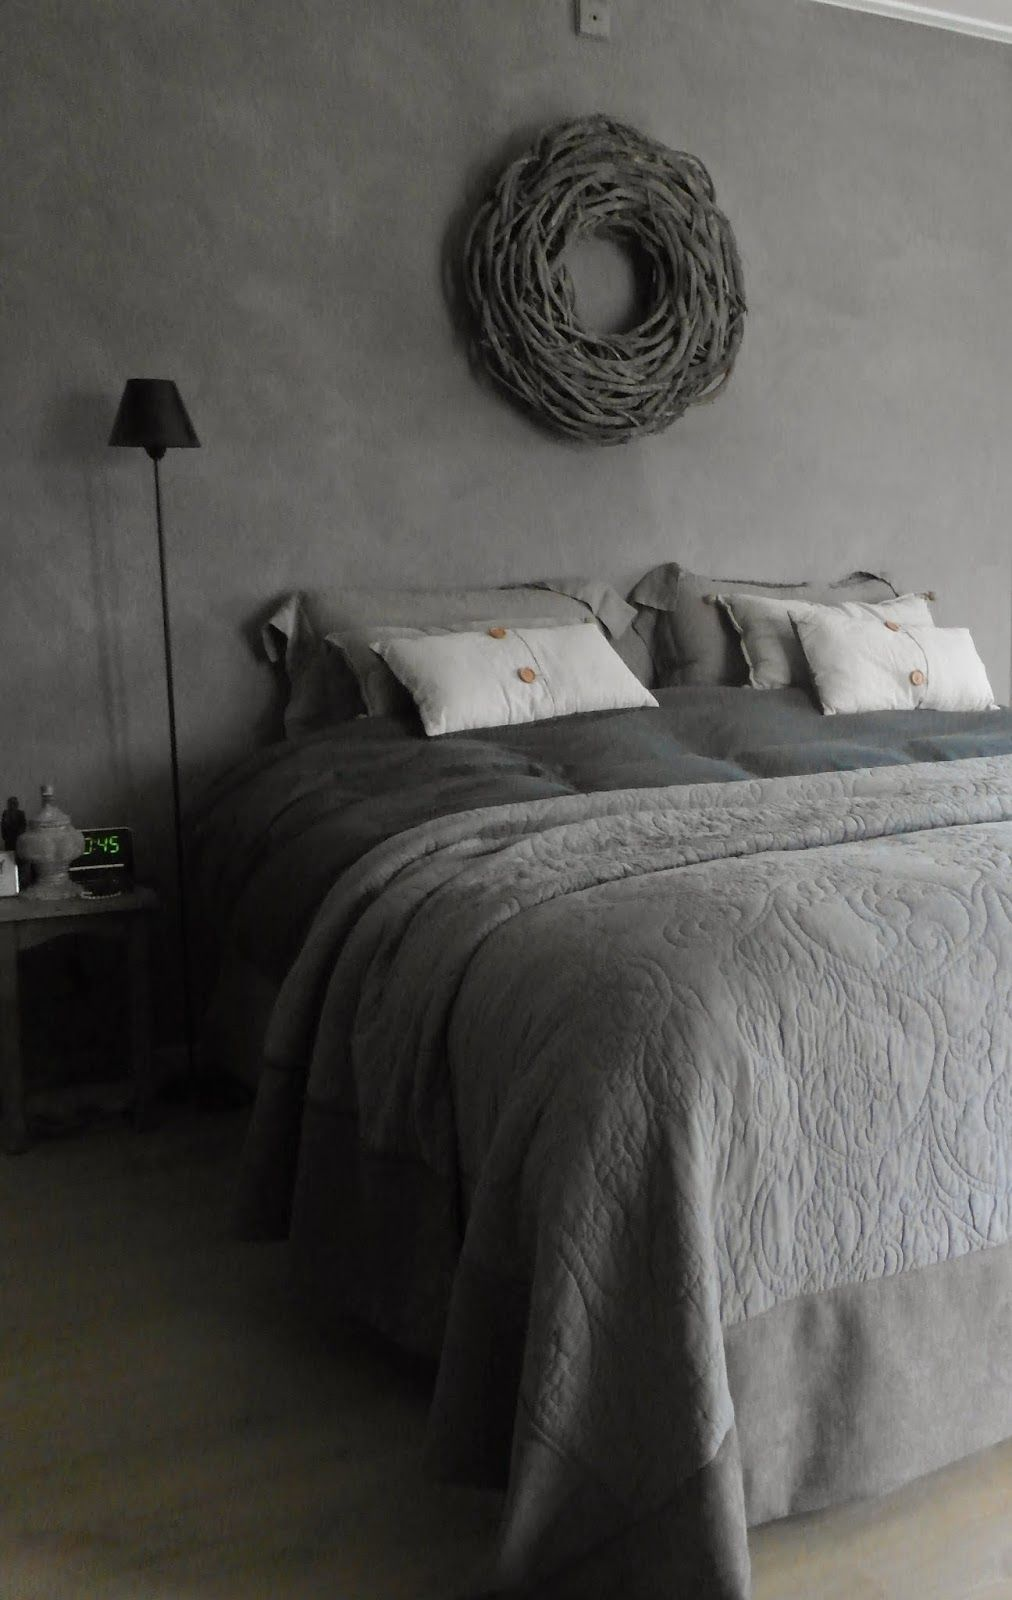 EasyLiving   slaapkamer   Pinterest - Slaapkamer, Slaapkamers en ...